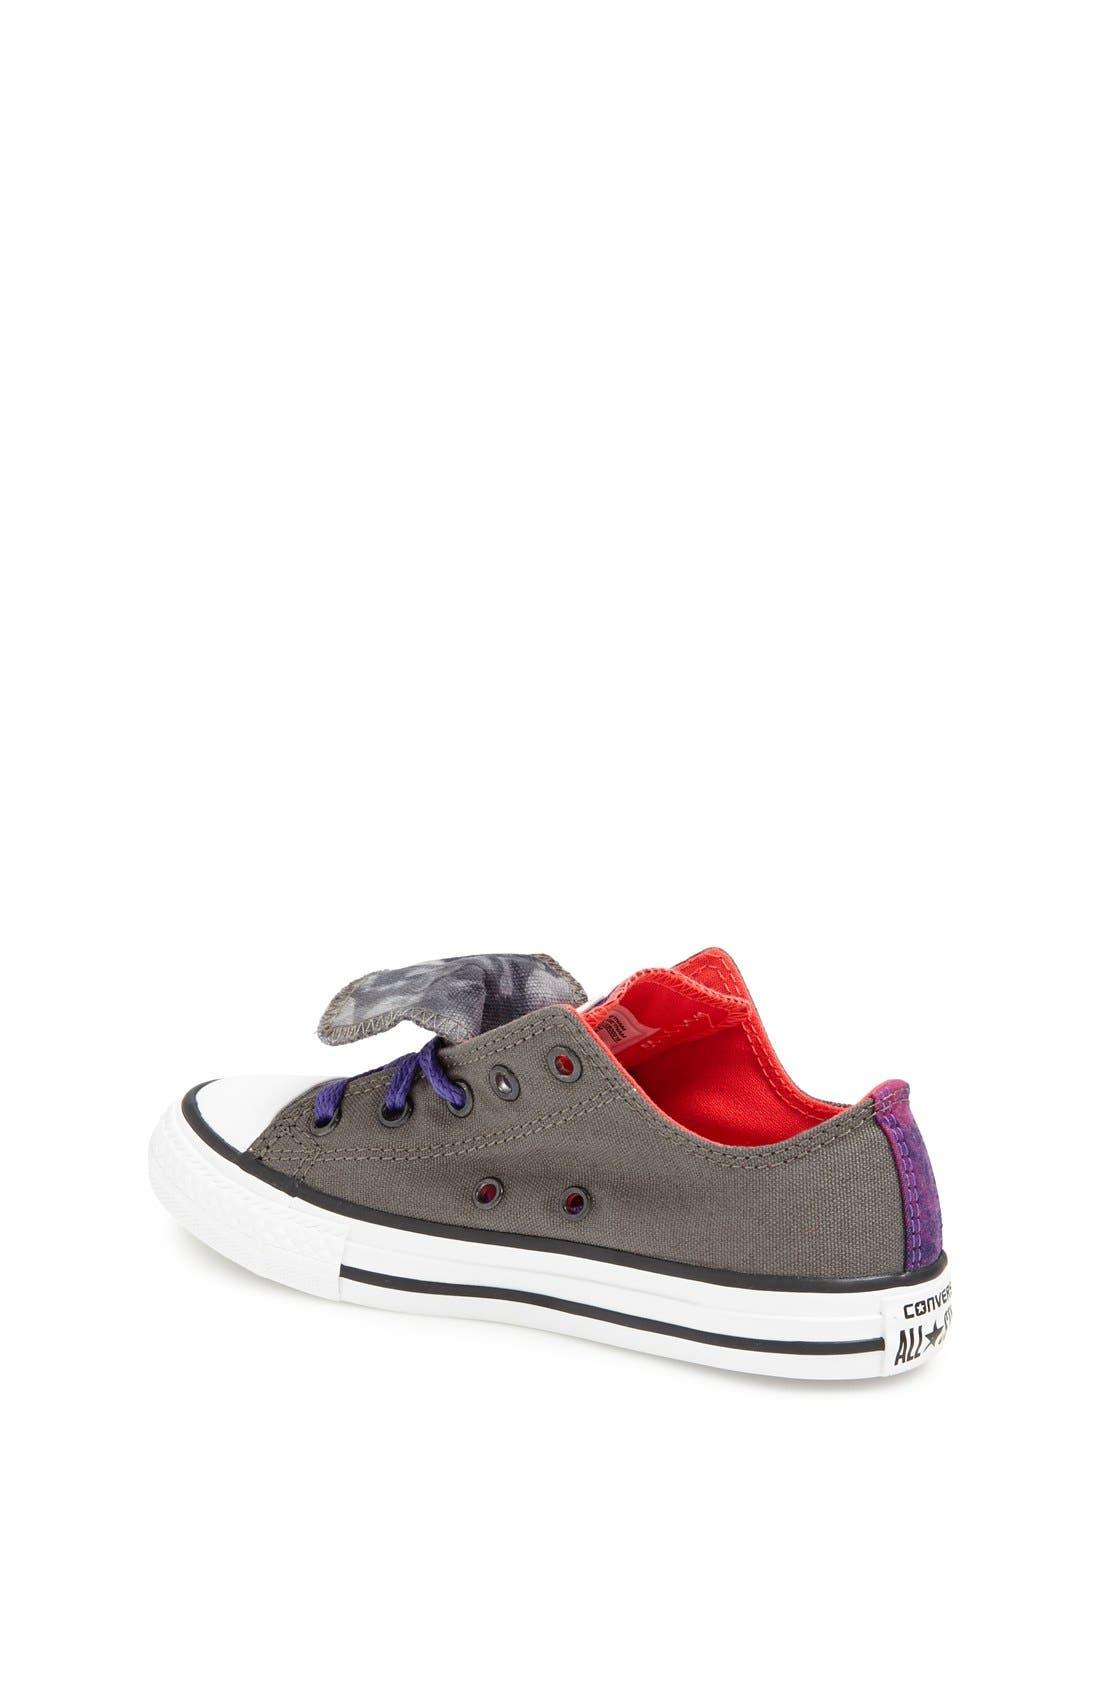 Alternate Image 3  - Converse Chuck Taylor® Double Zip Sneaker (Toddler, Little Kid & Big Kid)